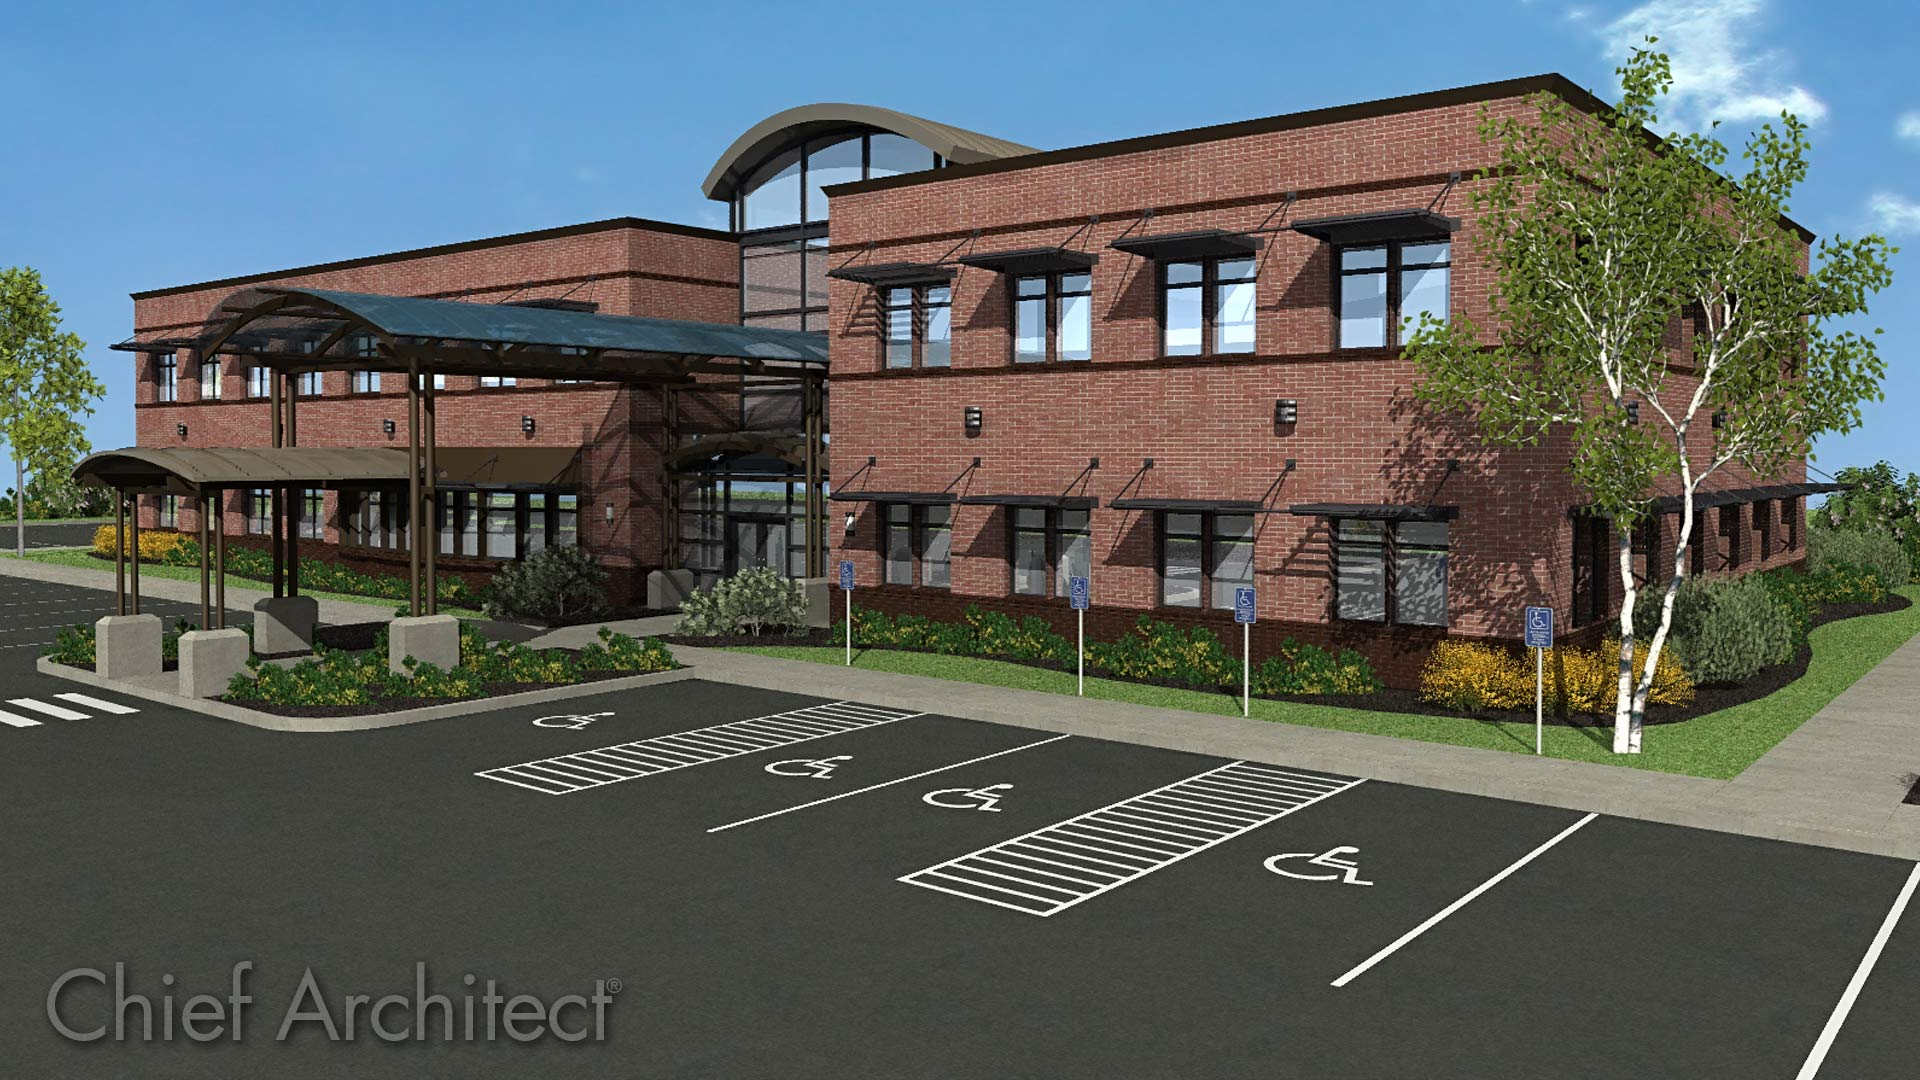 Chief architect x4 joy studio design gallery best design for Chief architect house plans